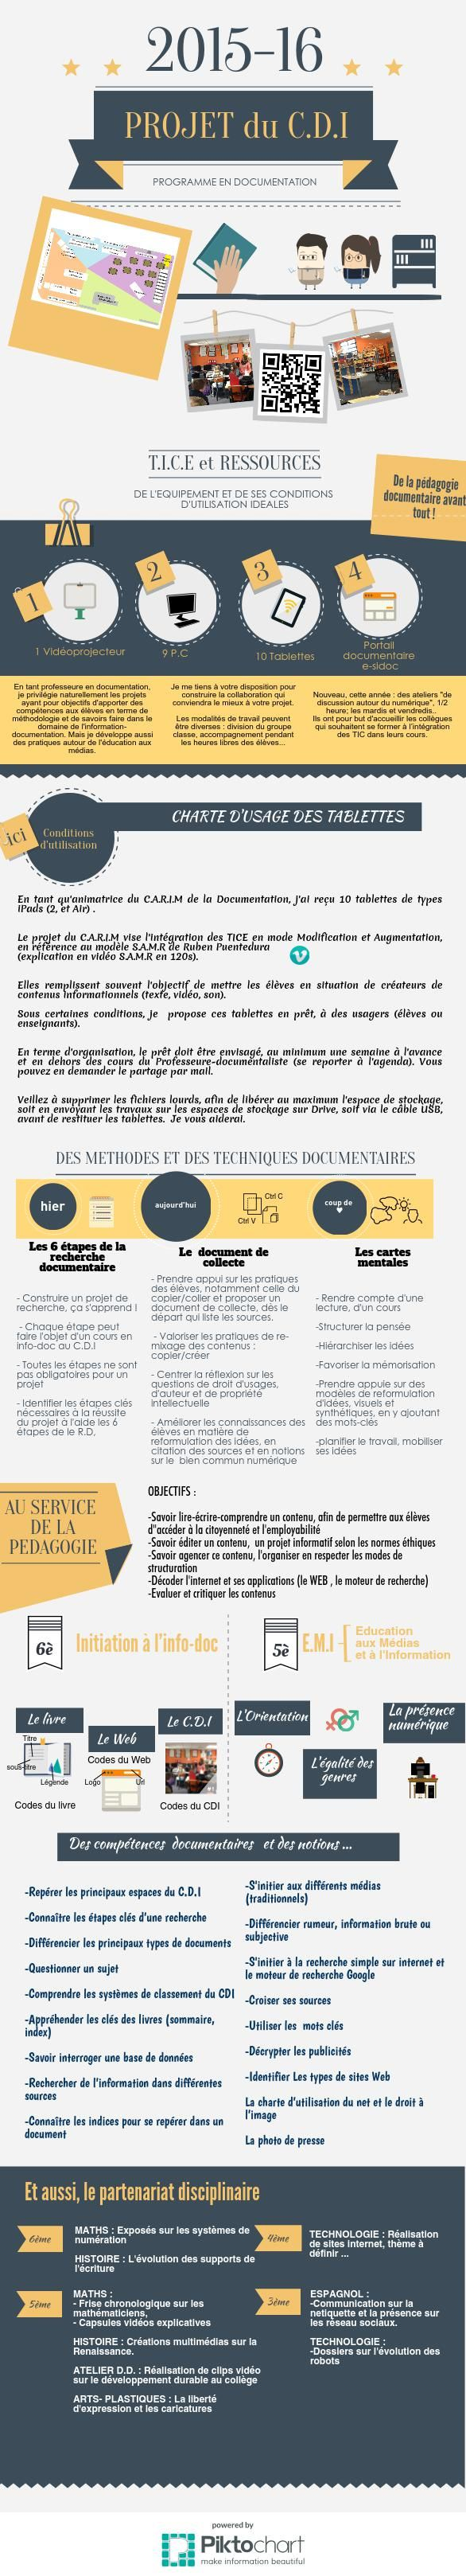 projetCDI2016   Piktochart Infographic Editor